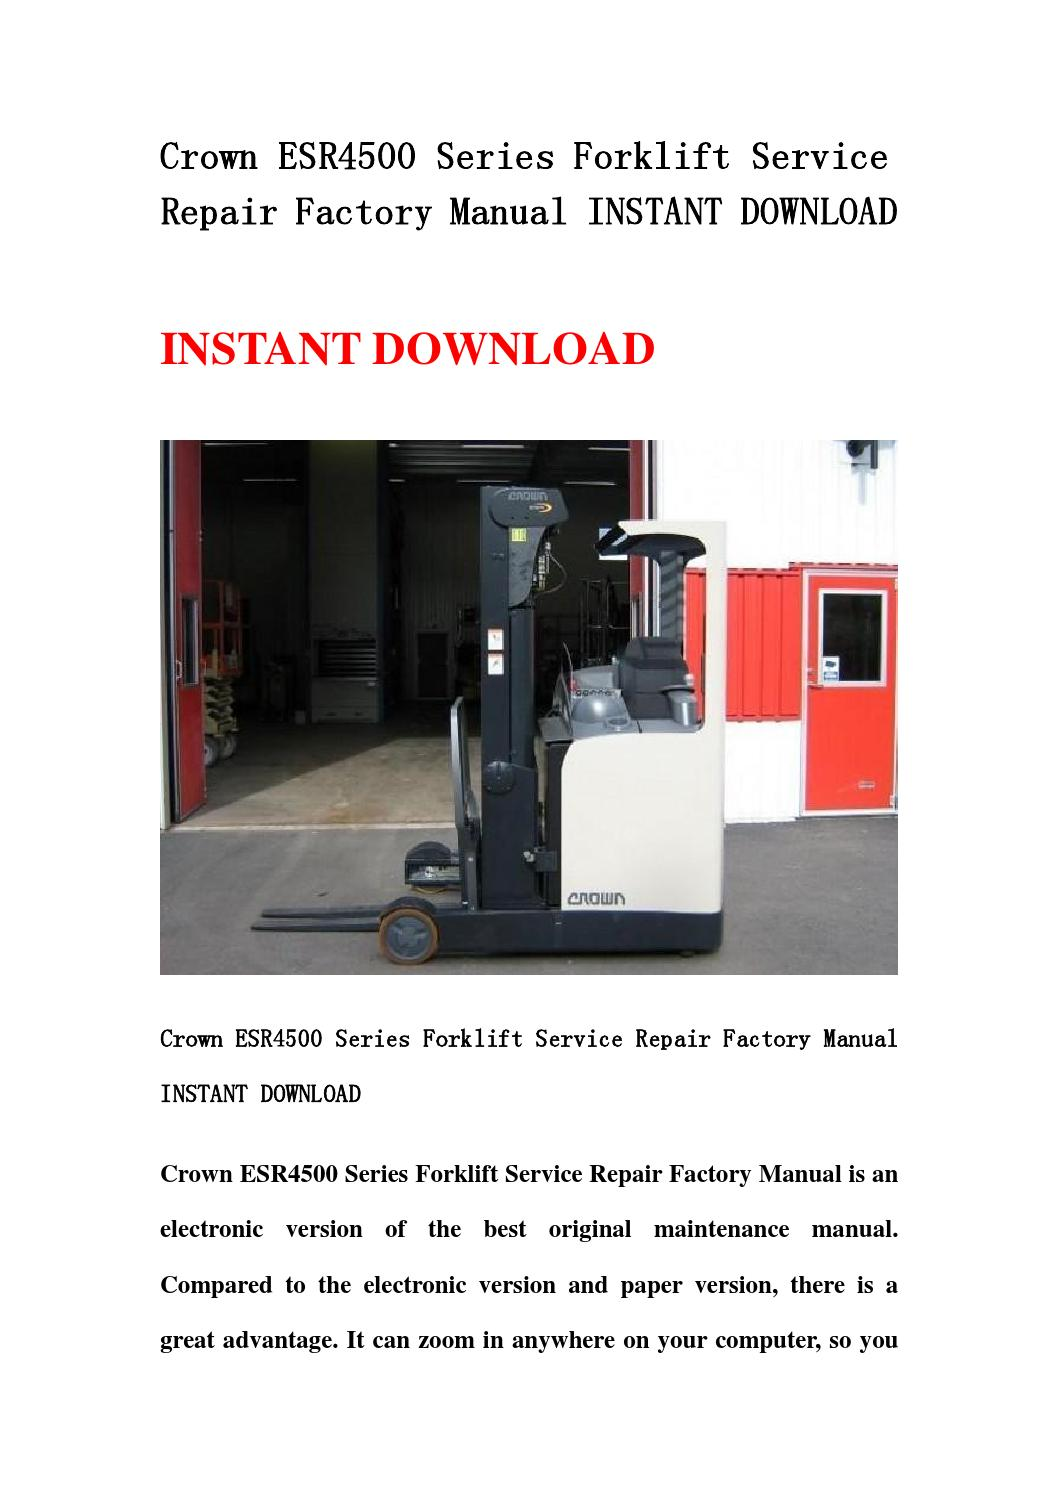 Crown esr series forklift service repair factory.